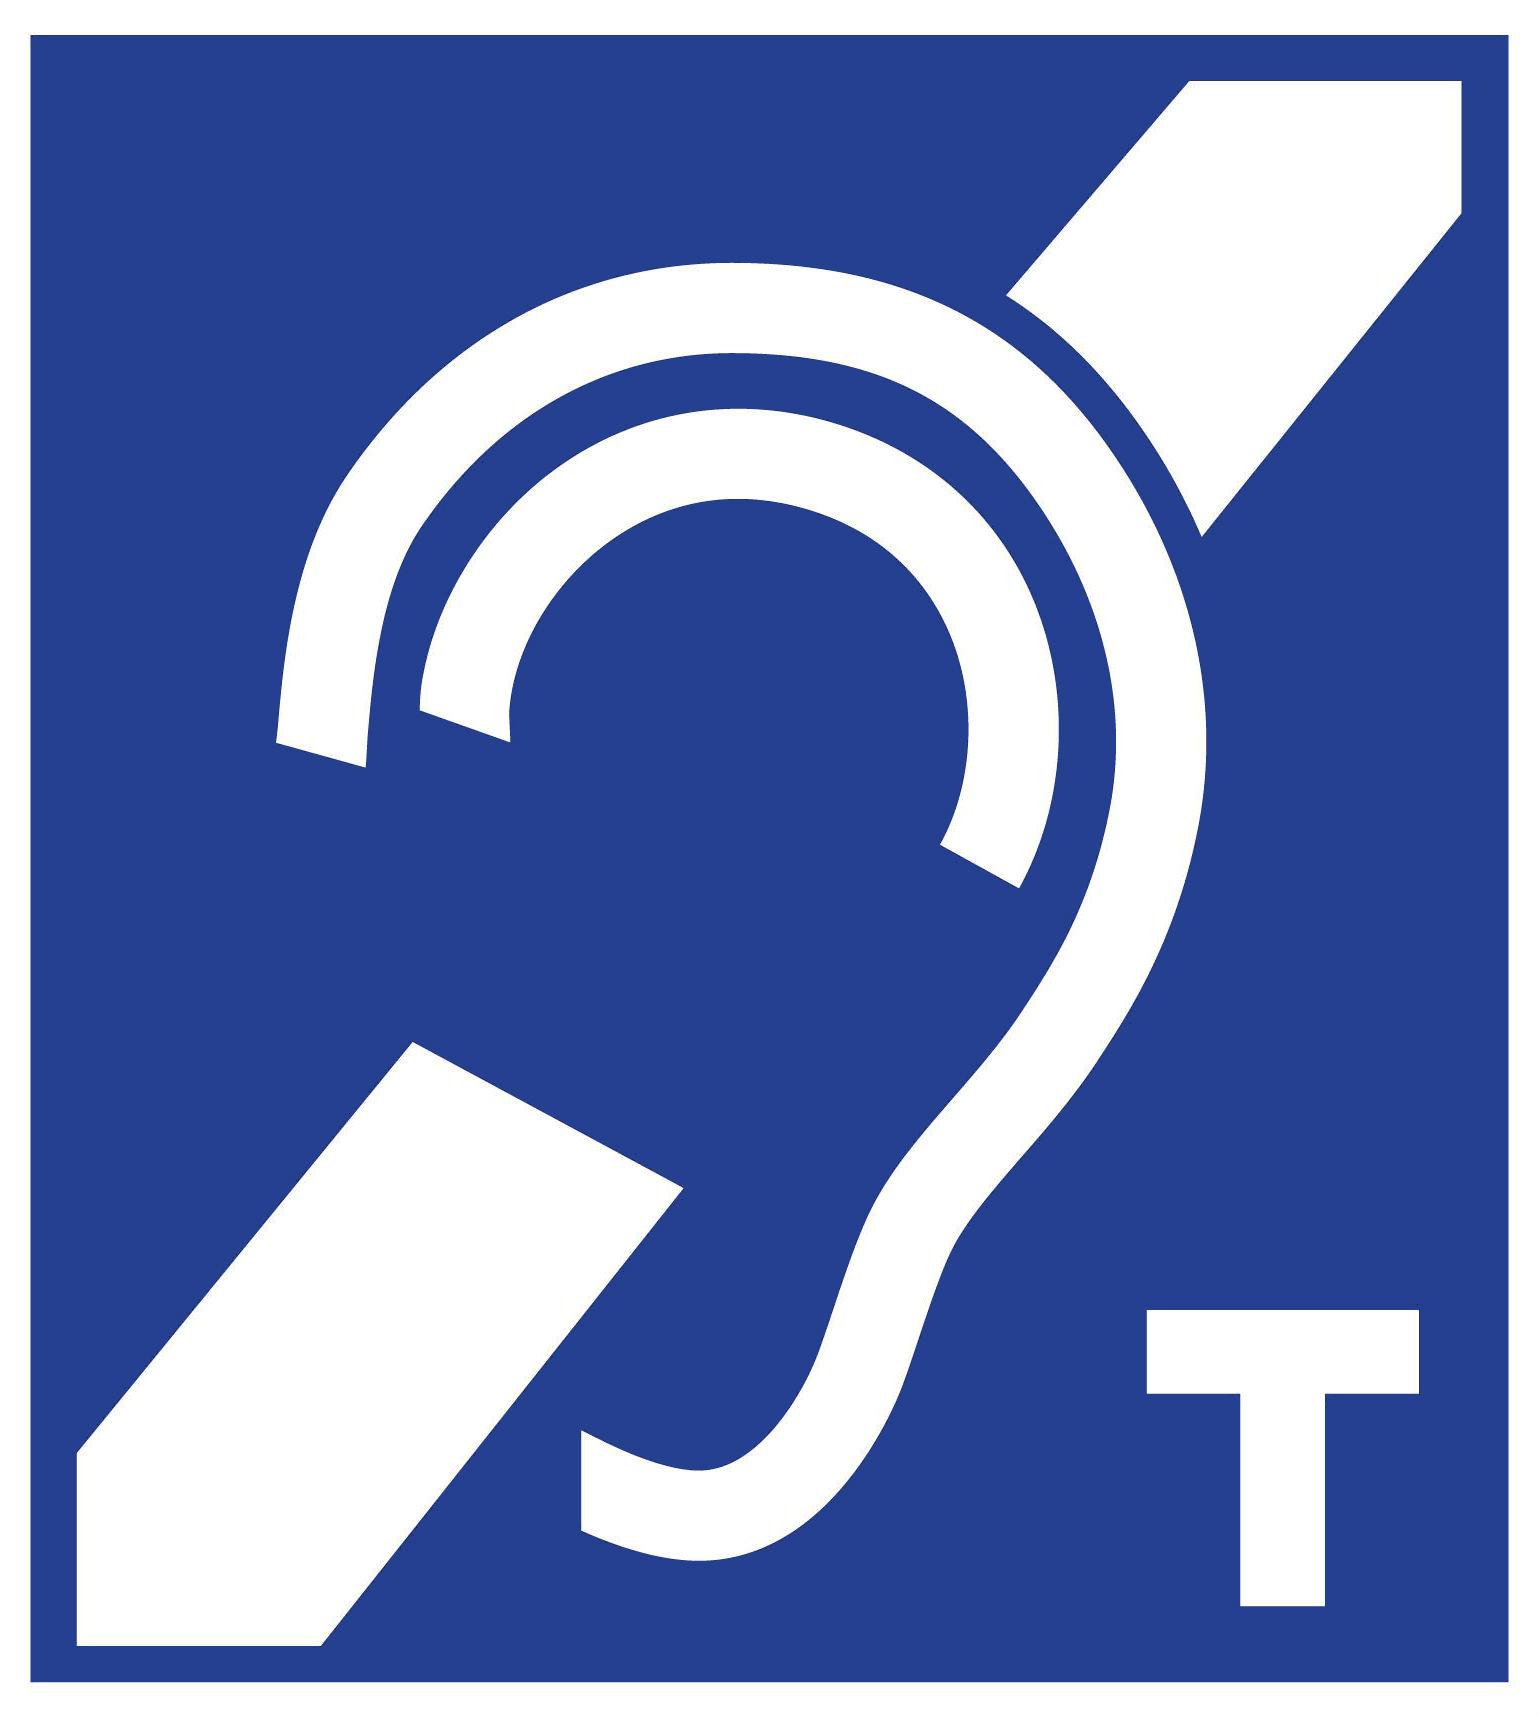 Simbol za sistem indukcijske zanke